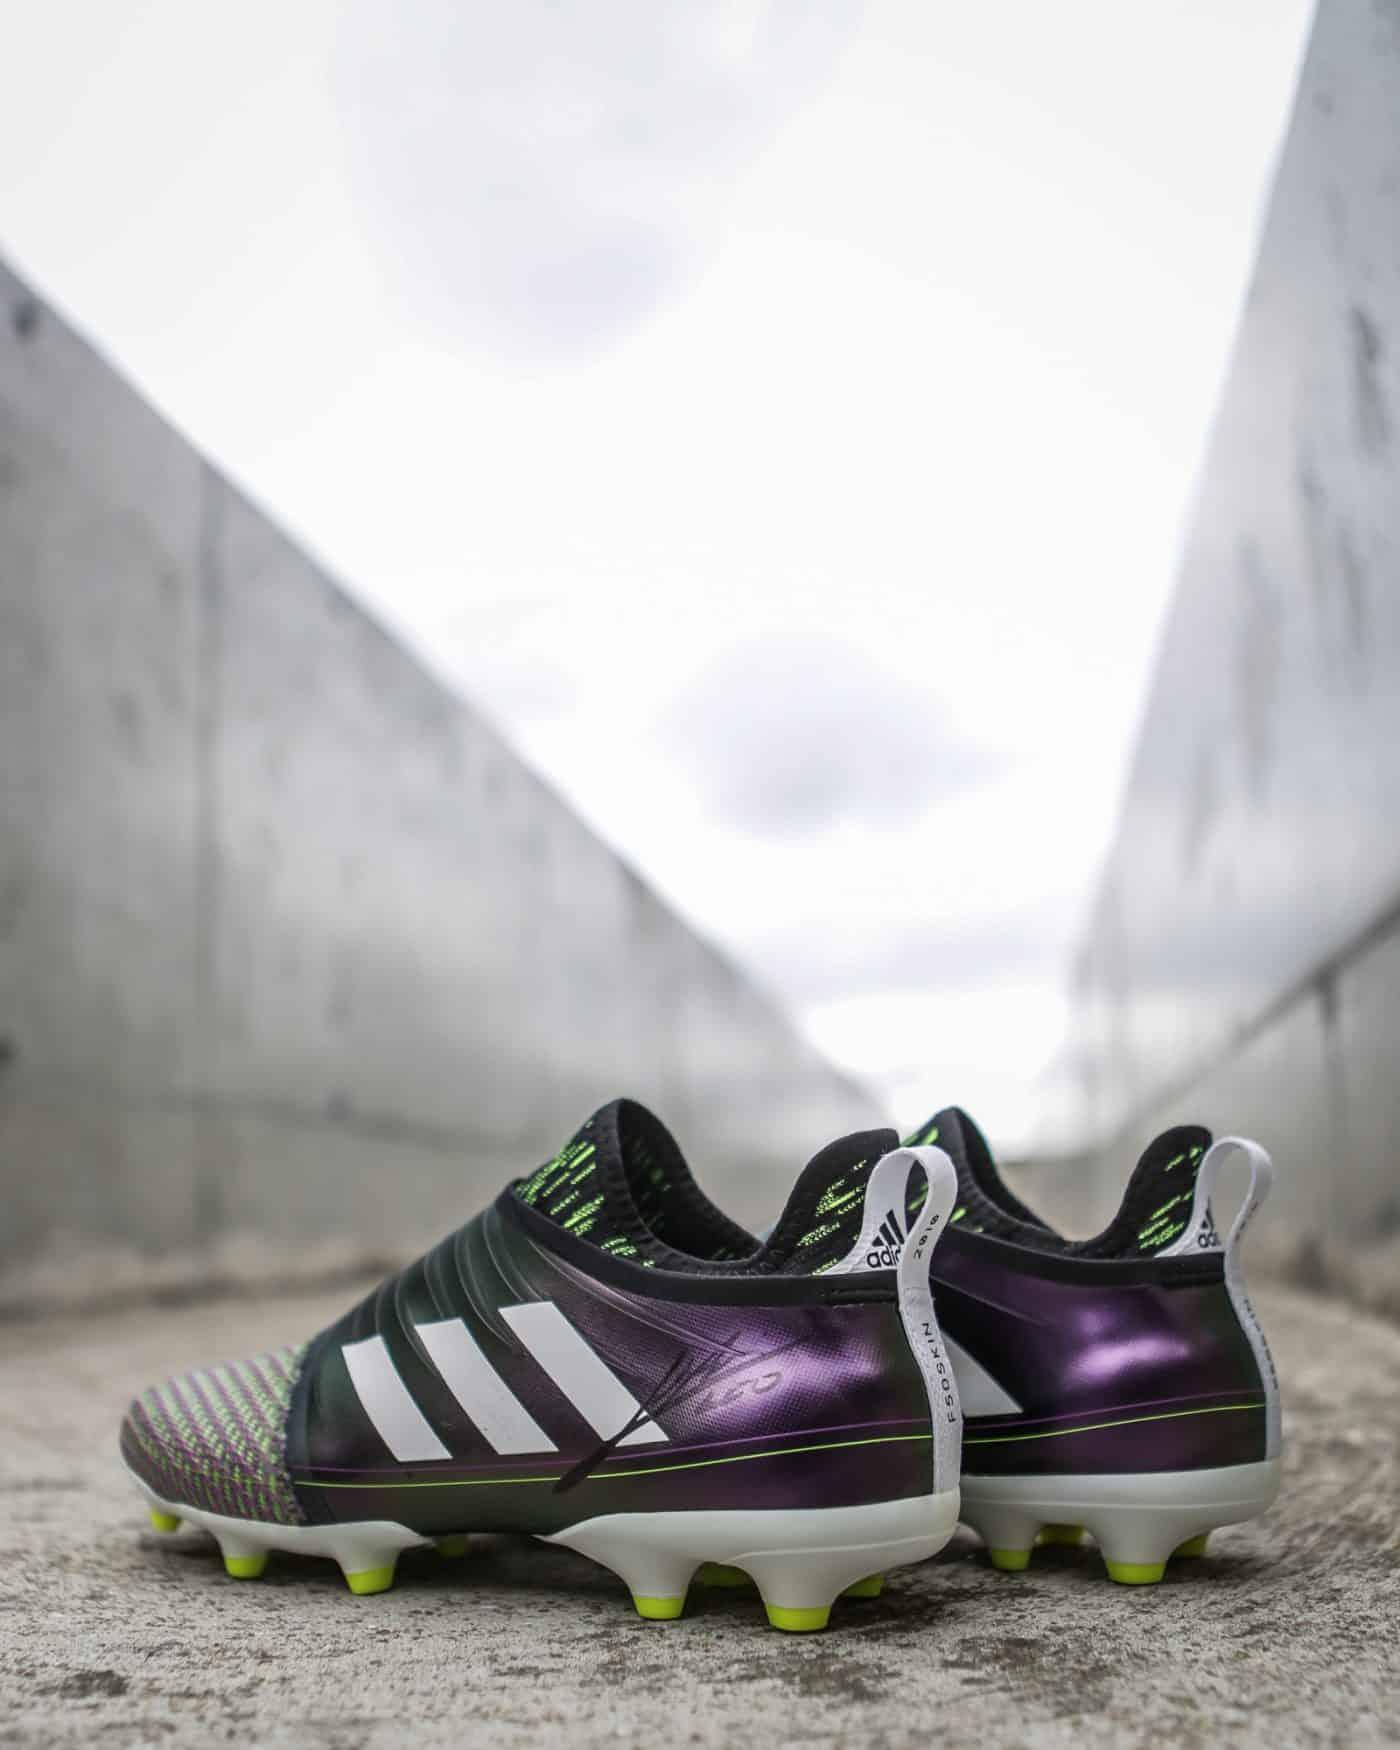 adidas-glitch-skin-F50-lionel-messi-footpack-4